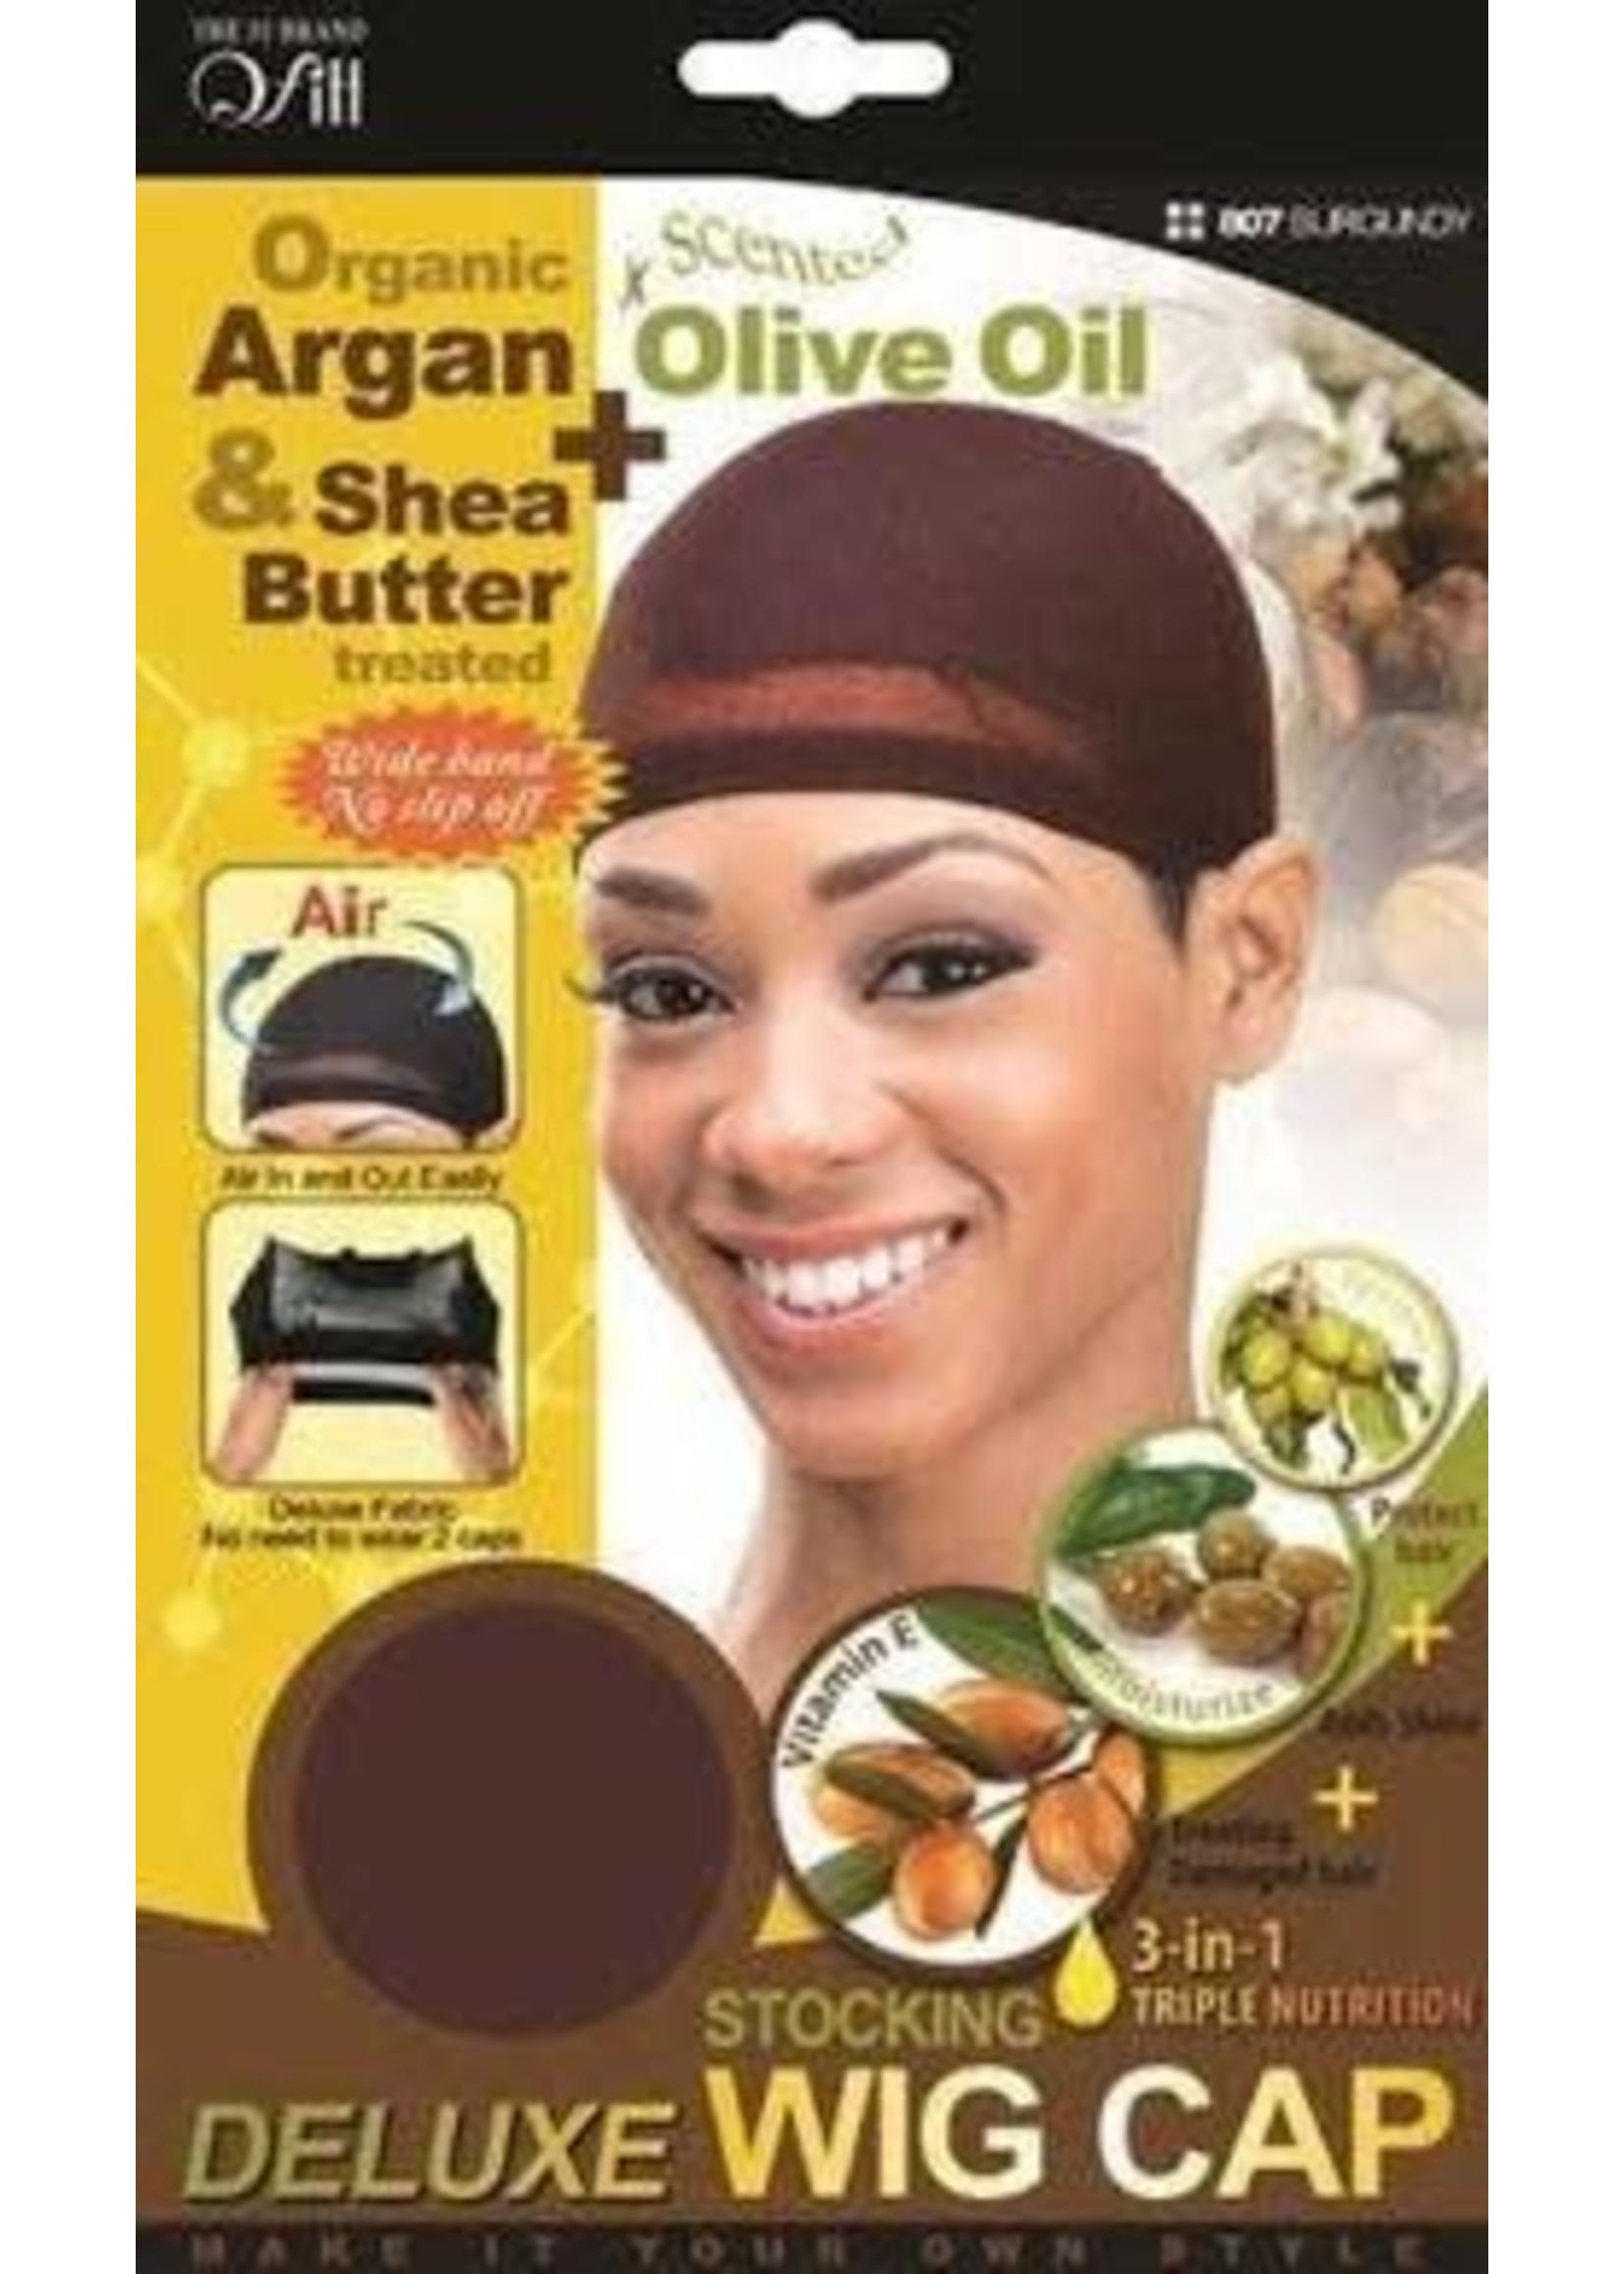 Organic Argan & Olive Oil Wig Cap Burgundy